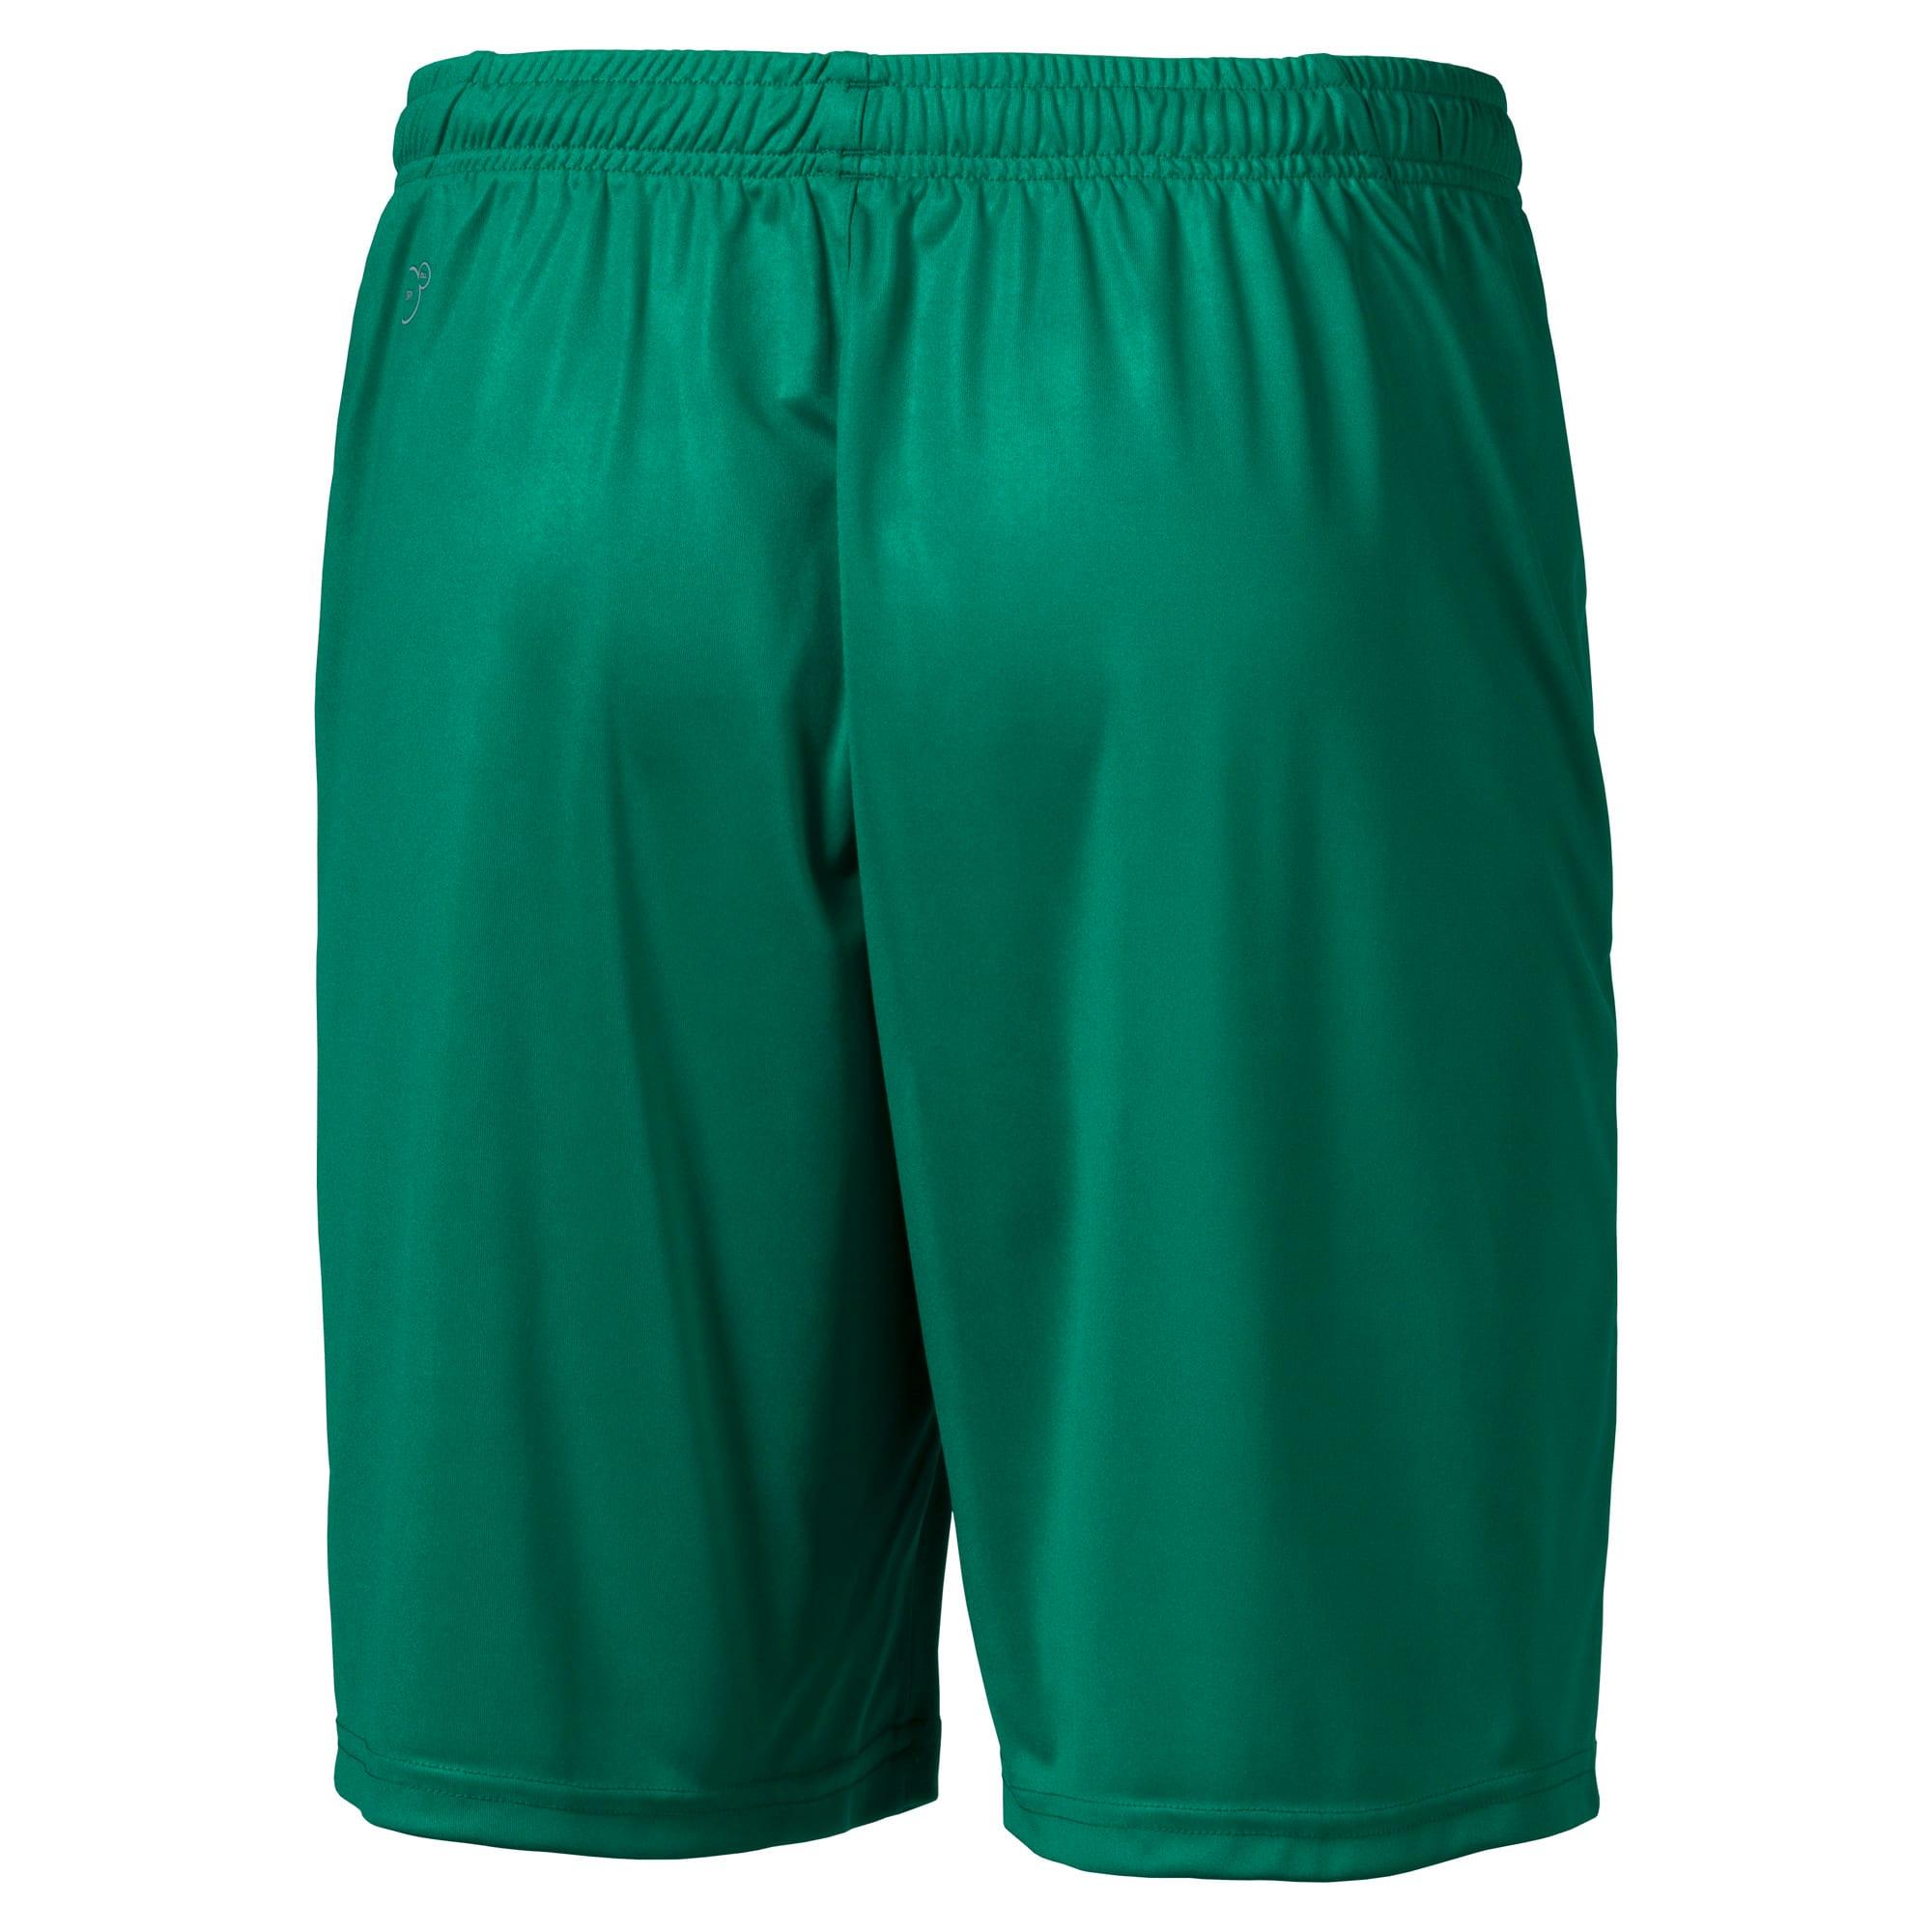 Thumbnail 4 of Liga Core Men's Shorts, Pepper Green-Puma White, medium